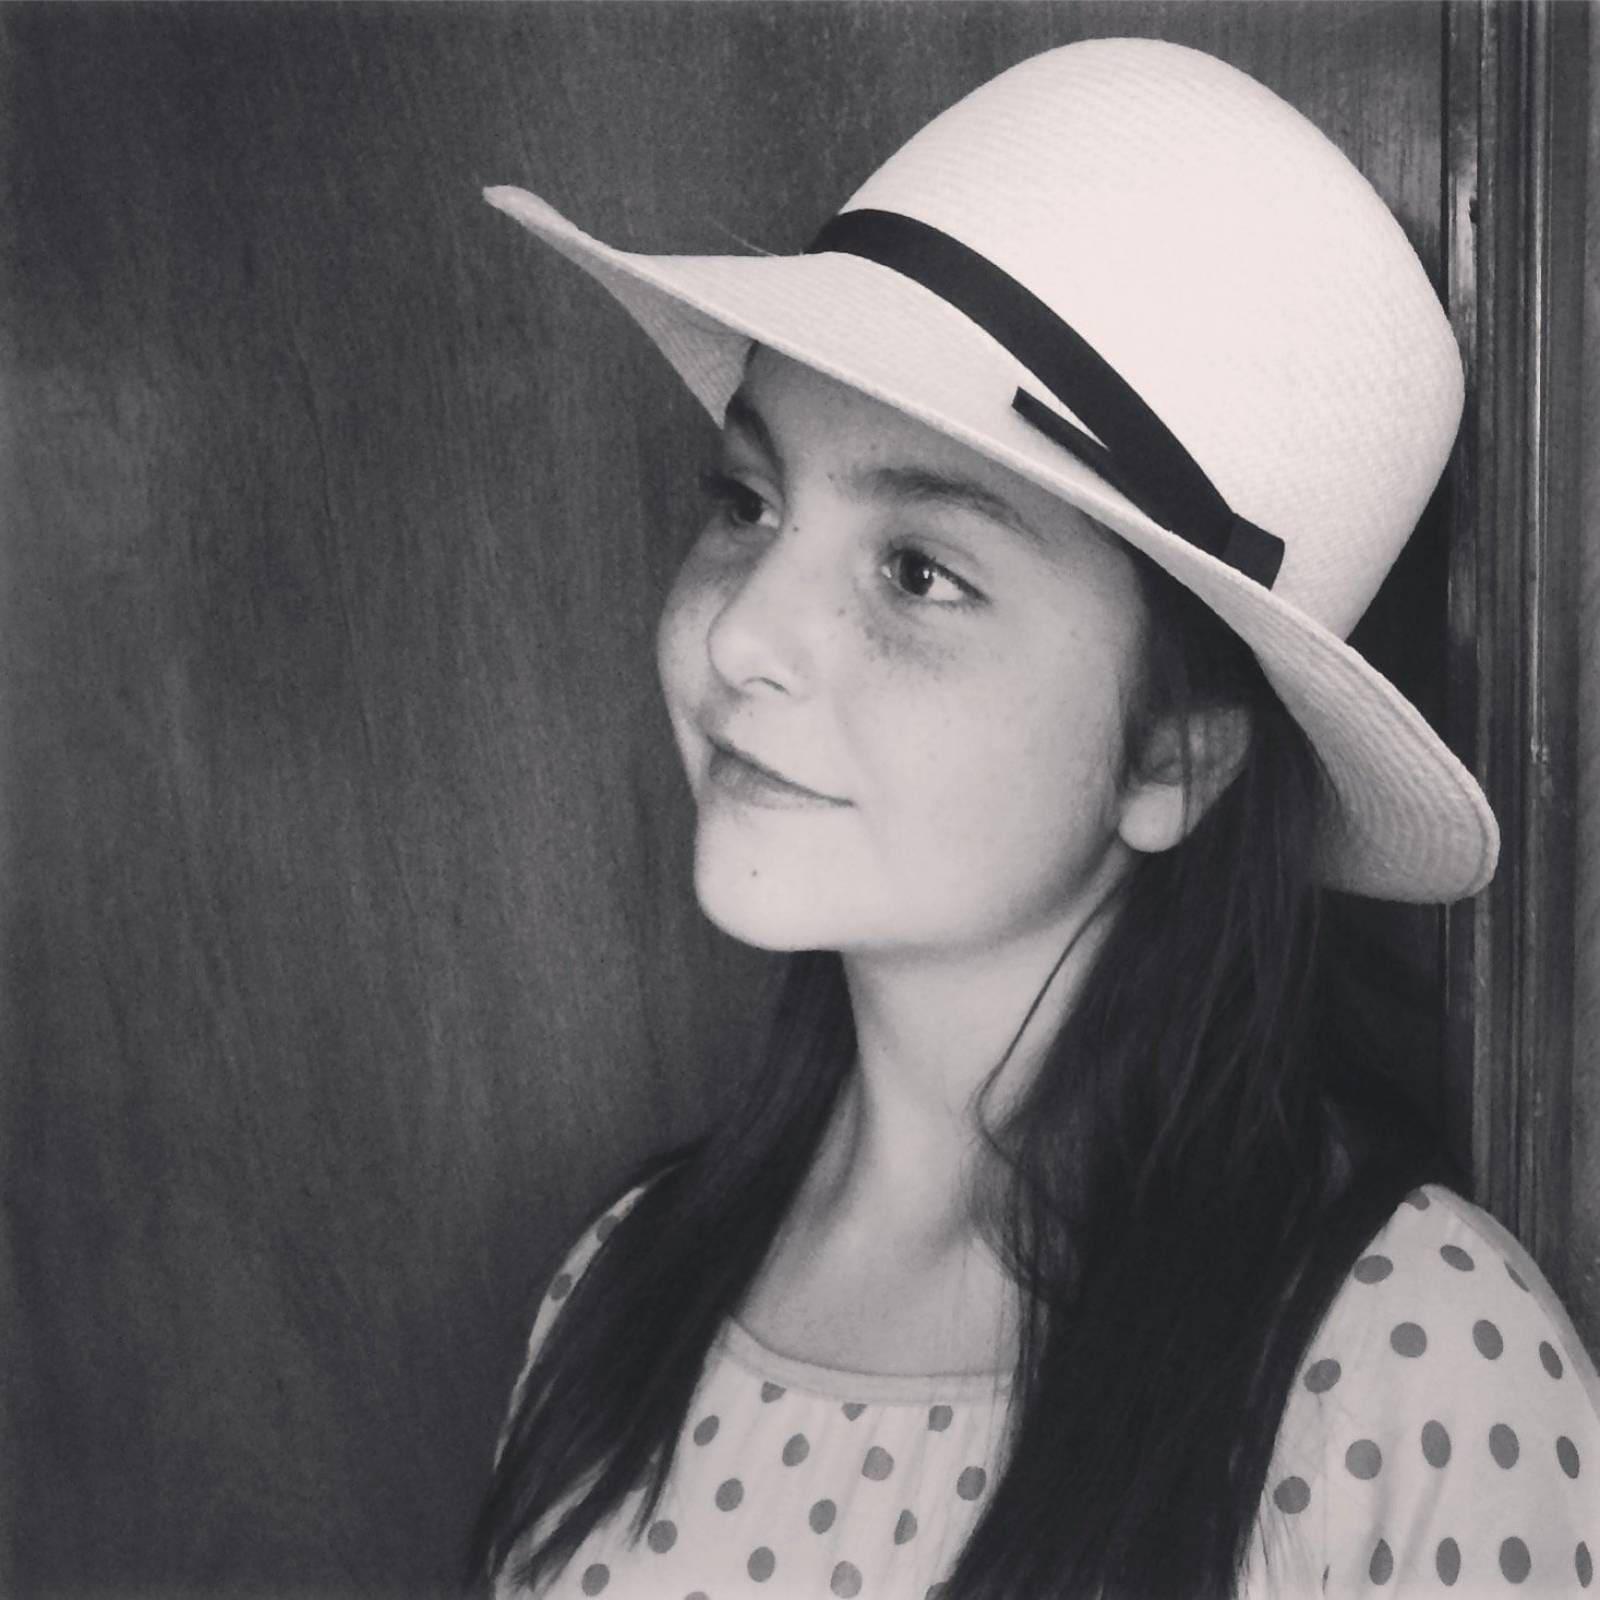 Sombrero Jipijapa Hecho A Mano Por Familias Mayas Modelo Dama